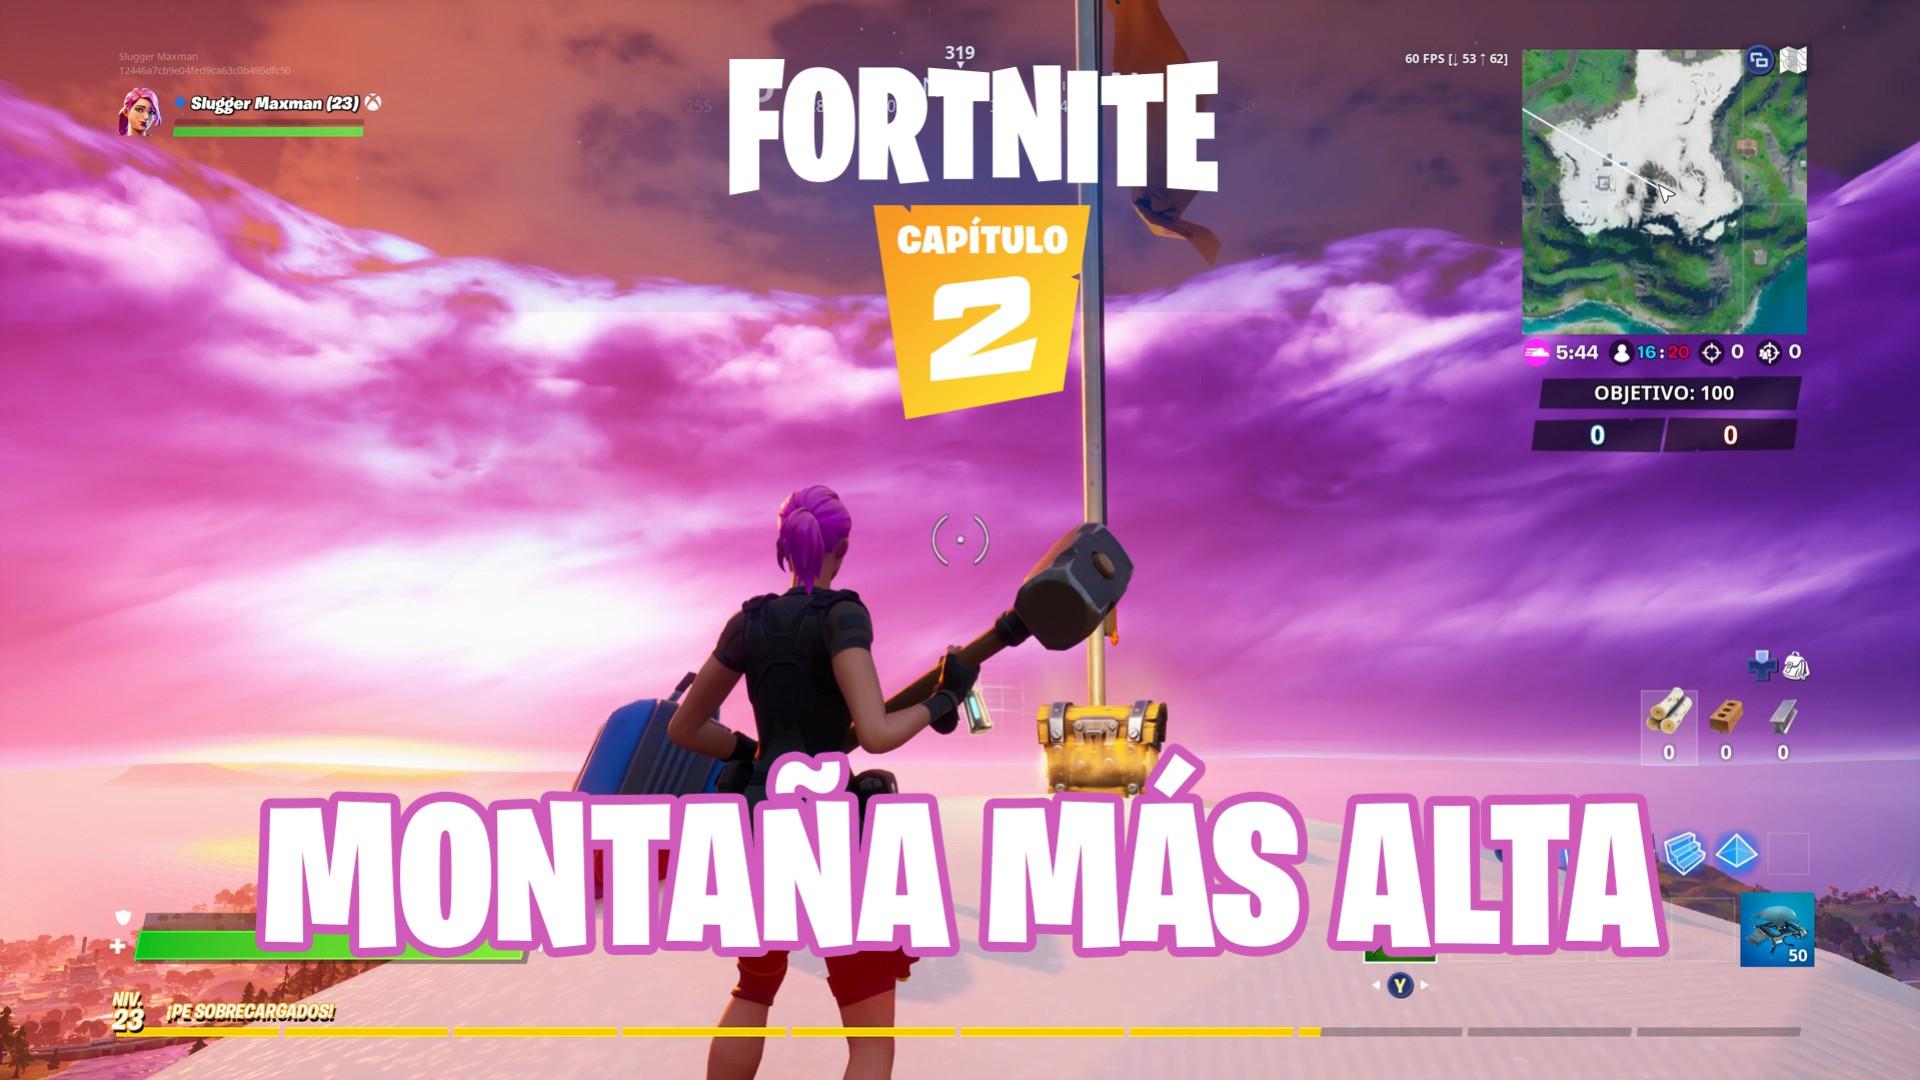 Desafio De Fortnite Llega Hasta La Cima De La Montana Mas Alta